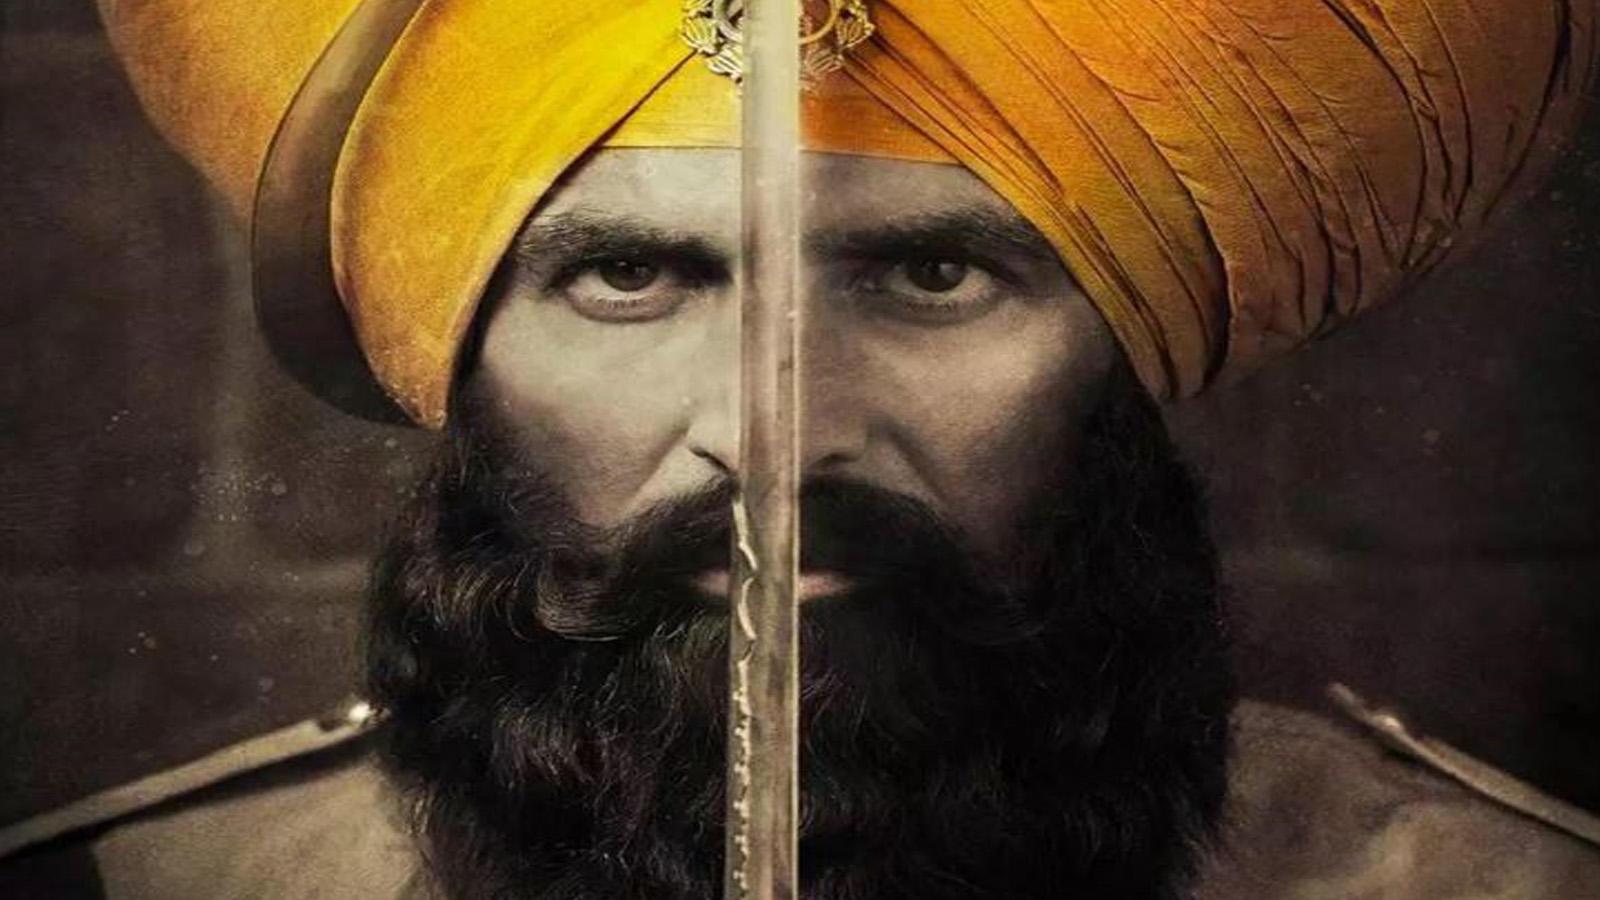 Akshay Kumar shares glimpses of his new film 'Kesari'